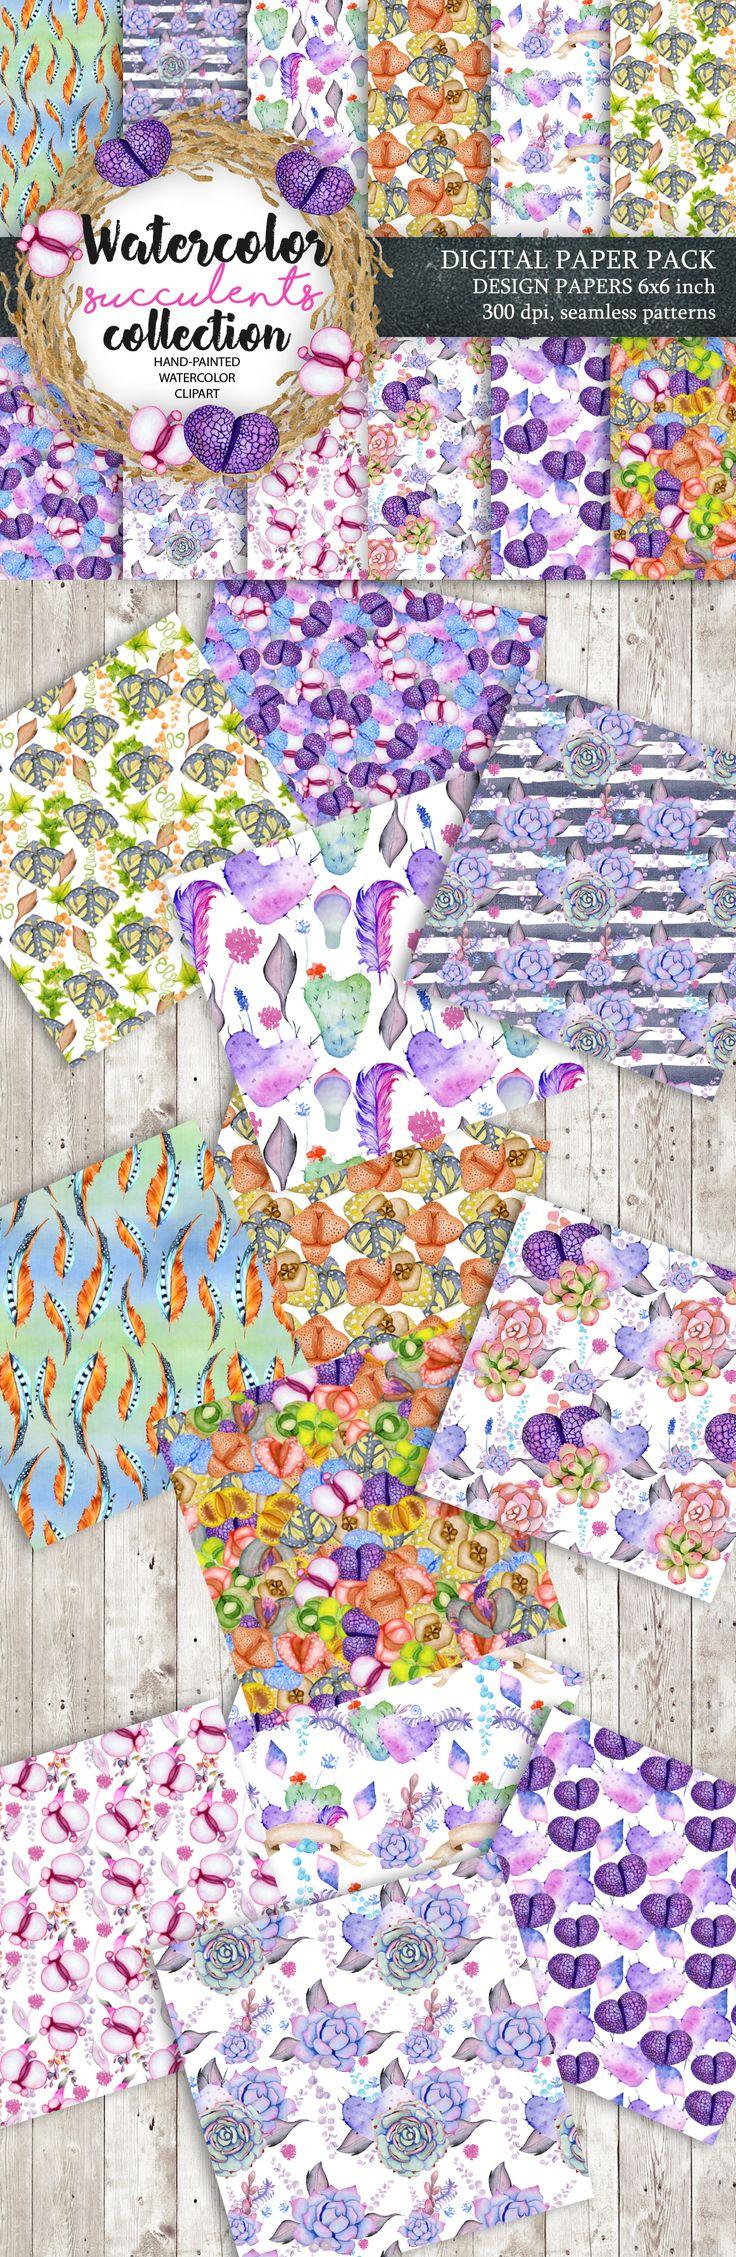 Digital Paper Pack, Waterclor seamless pattern, Watercolor Backgrounds, Floral Scrapbook Paper, Wedding Floral, DIY Pack, Succulent clip art